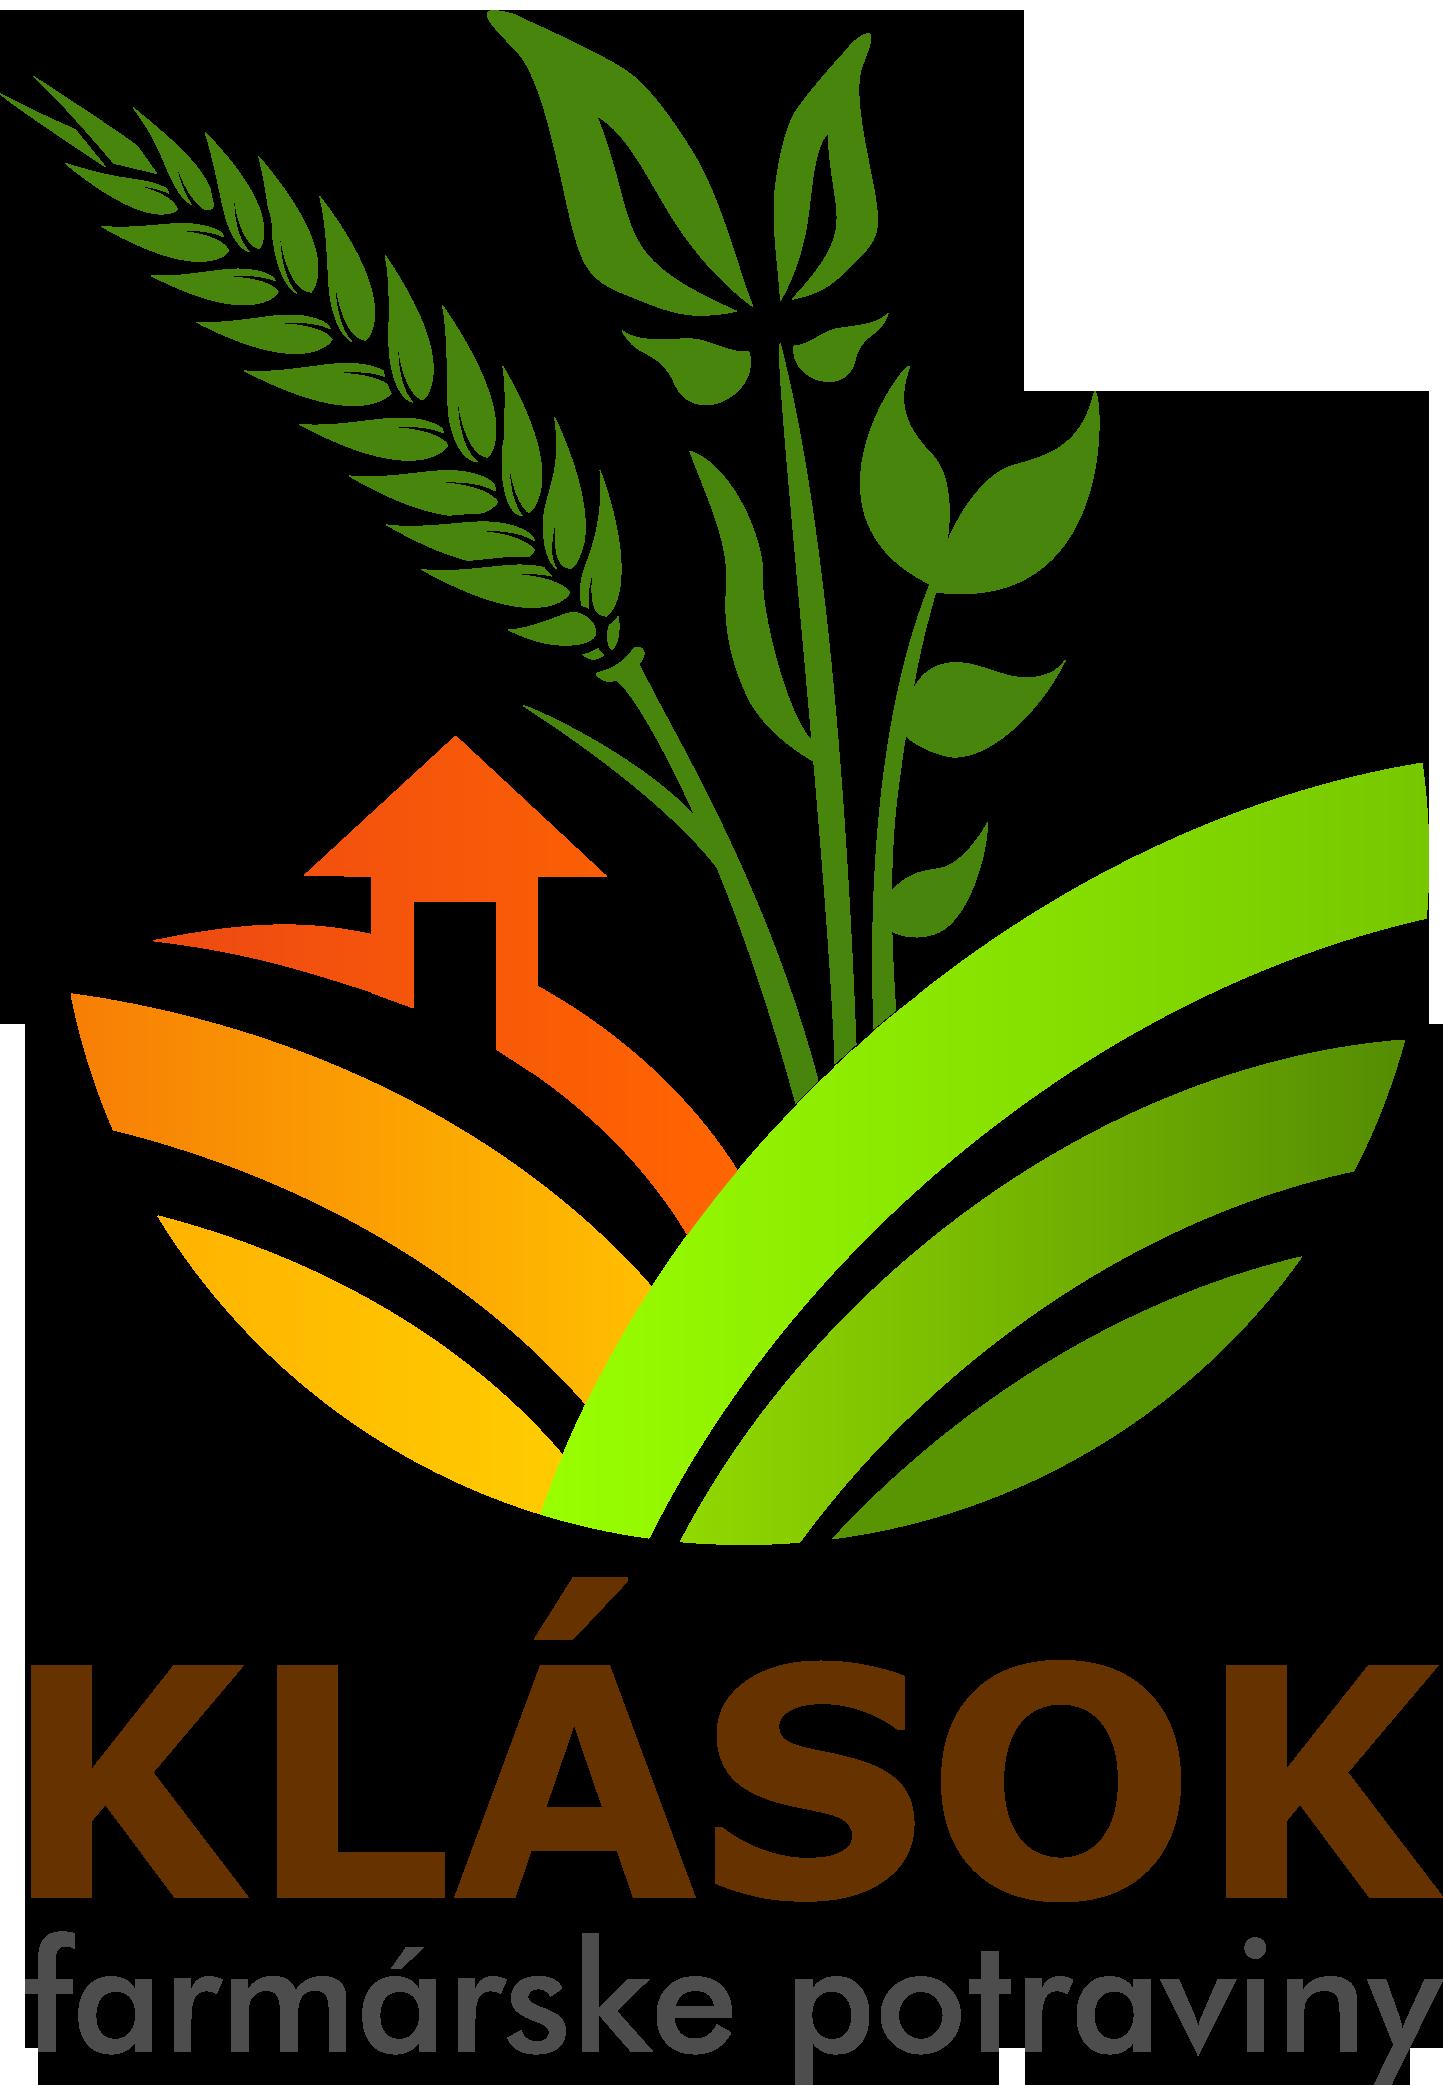 www.klasokprievidza.sk